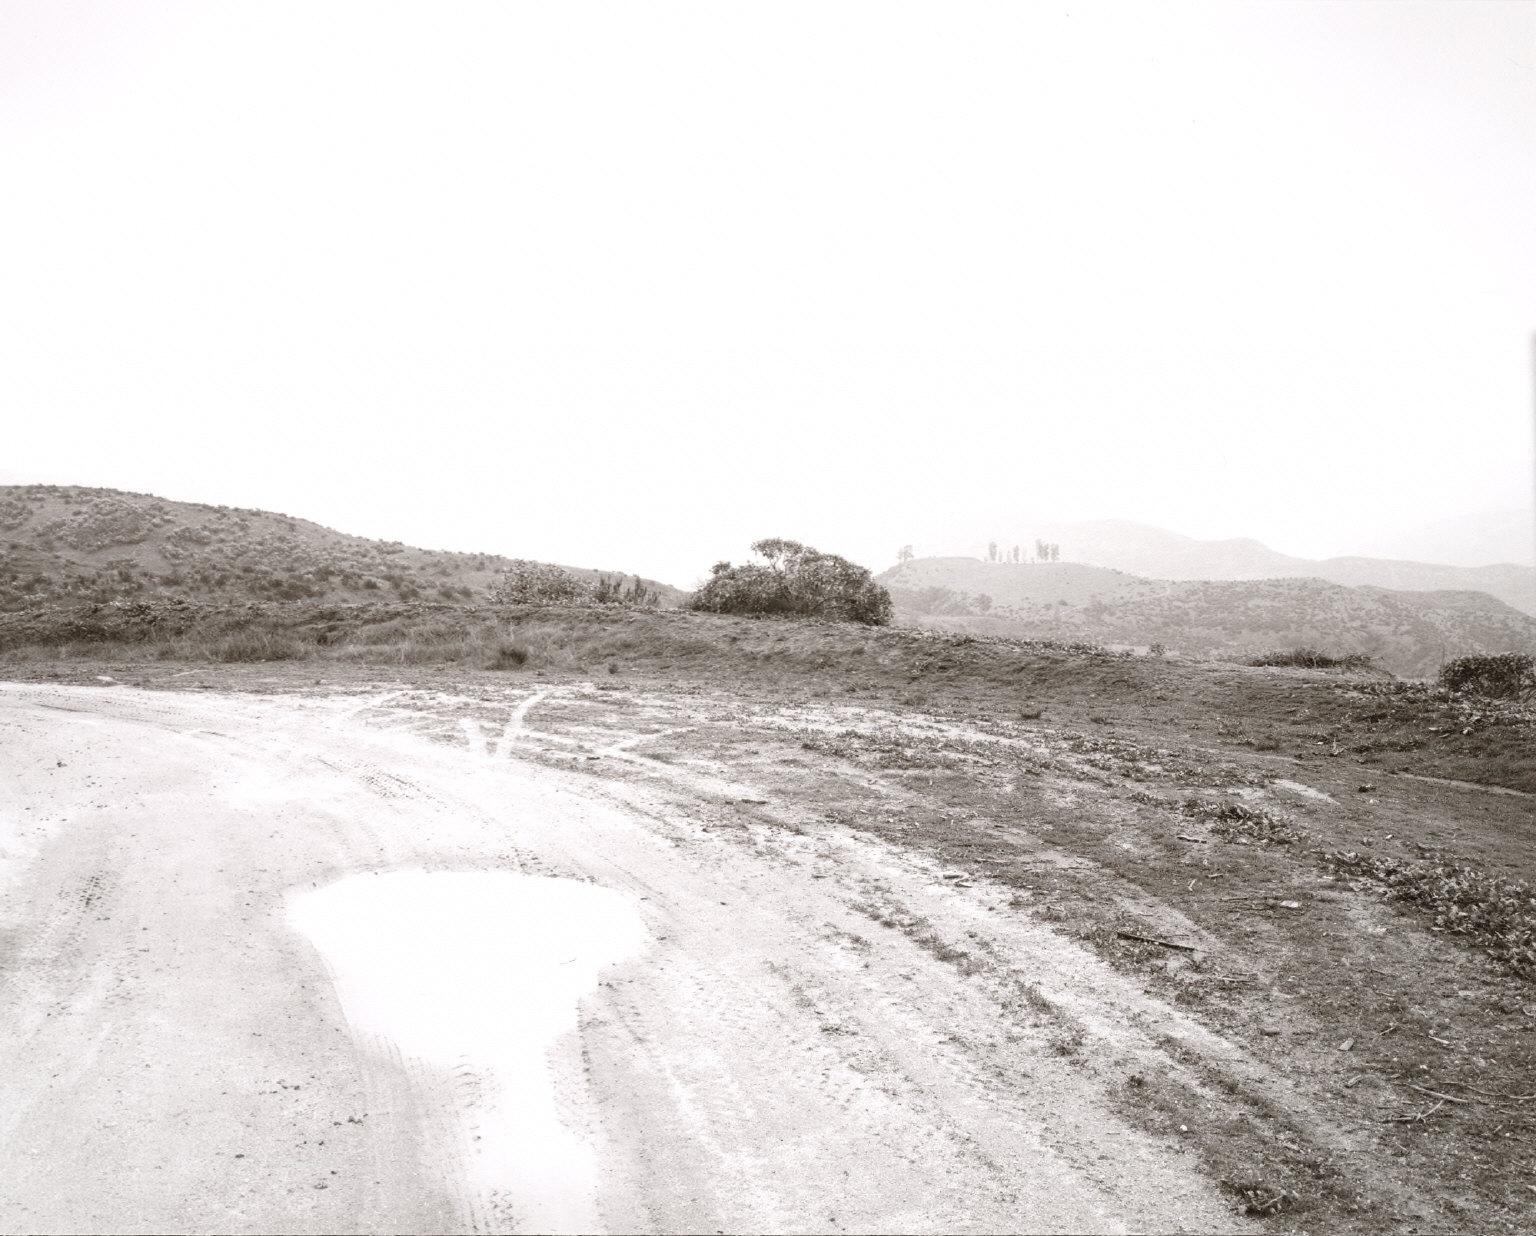 Development Road in San Timoteo Canyon, San Bernardino County, California